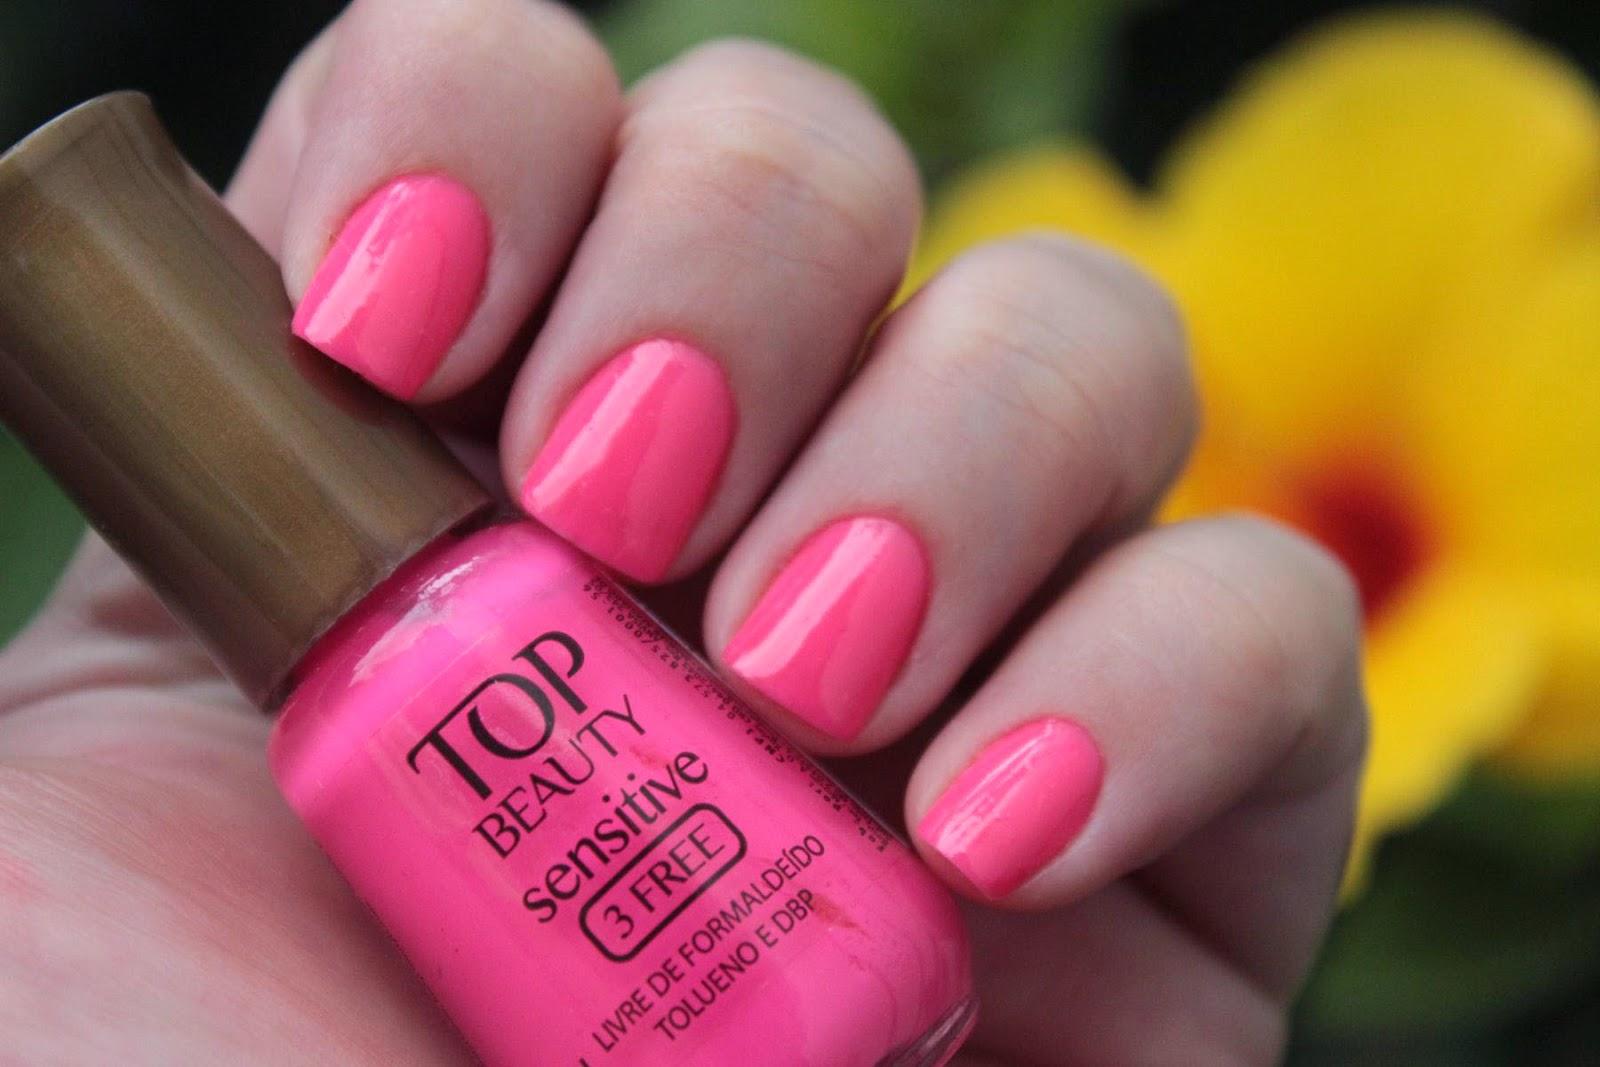 mão feita, esmalte, top beauty, pink, neon, rosa, nailpolish, 3free, hipoalergênico